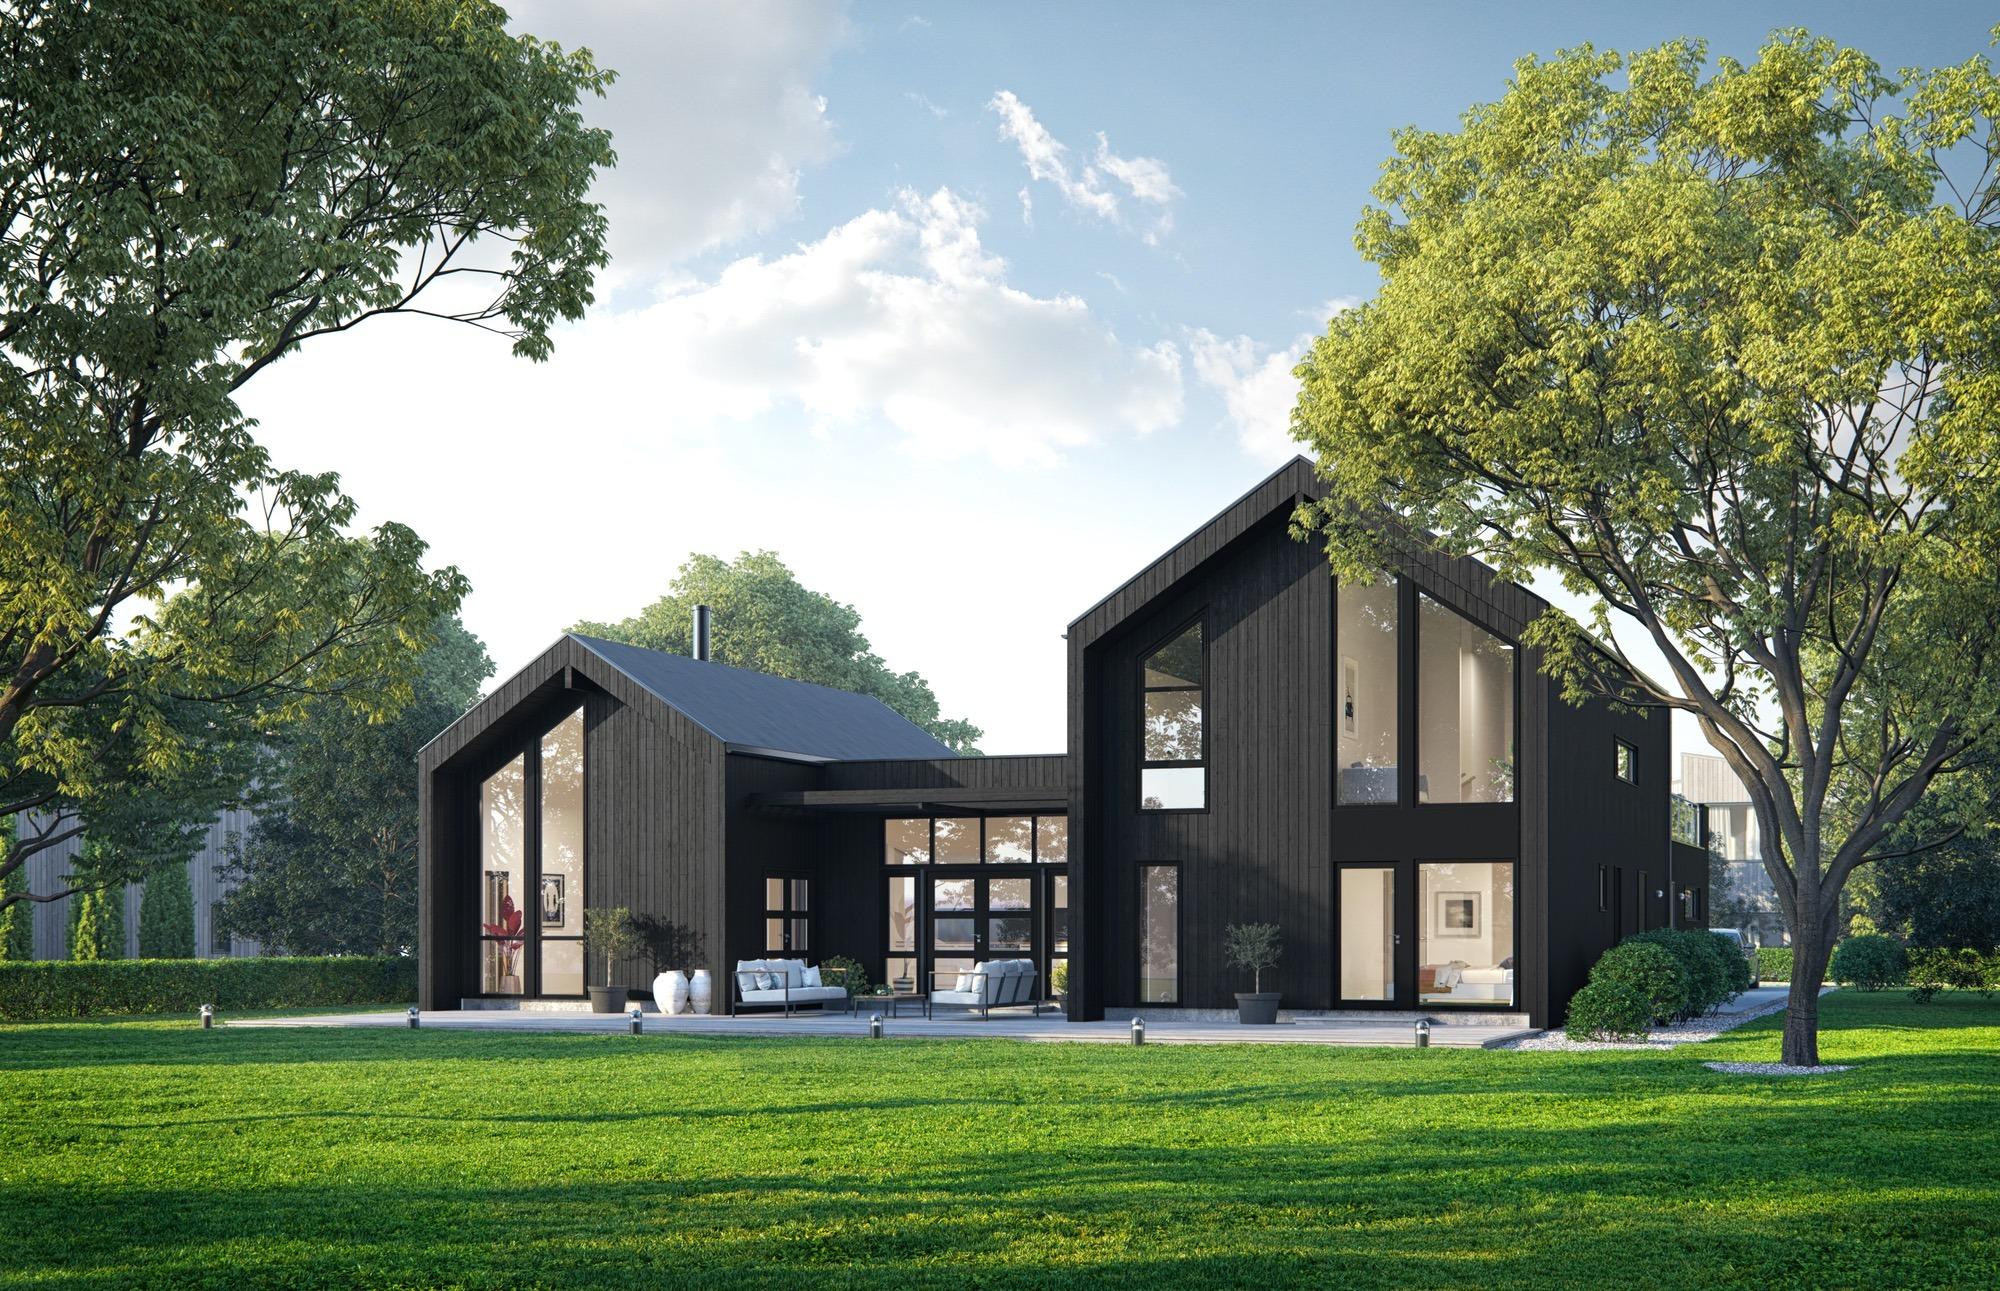 Blink hus Kongsberg hageside